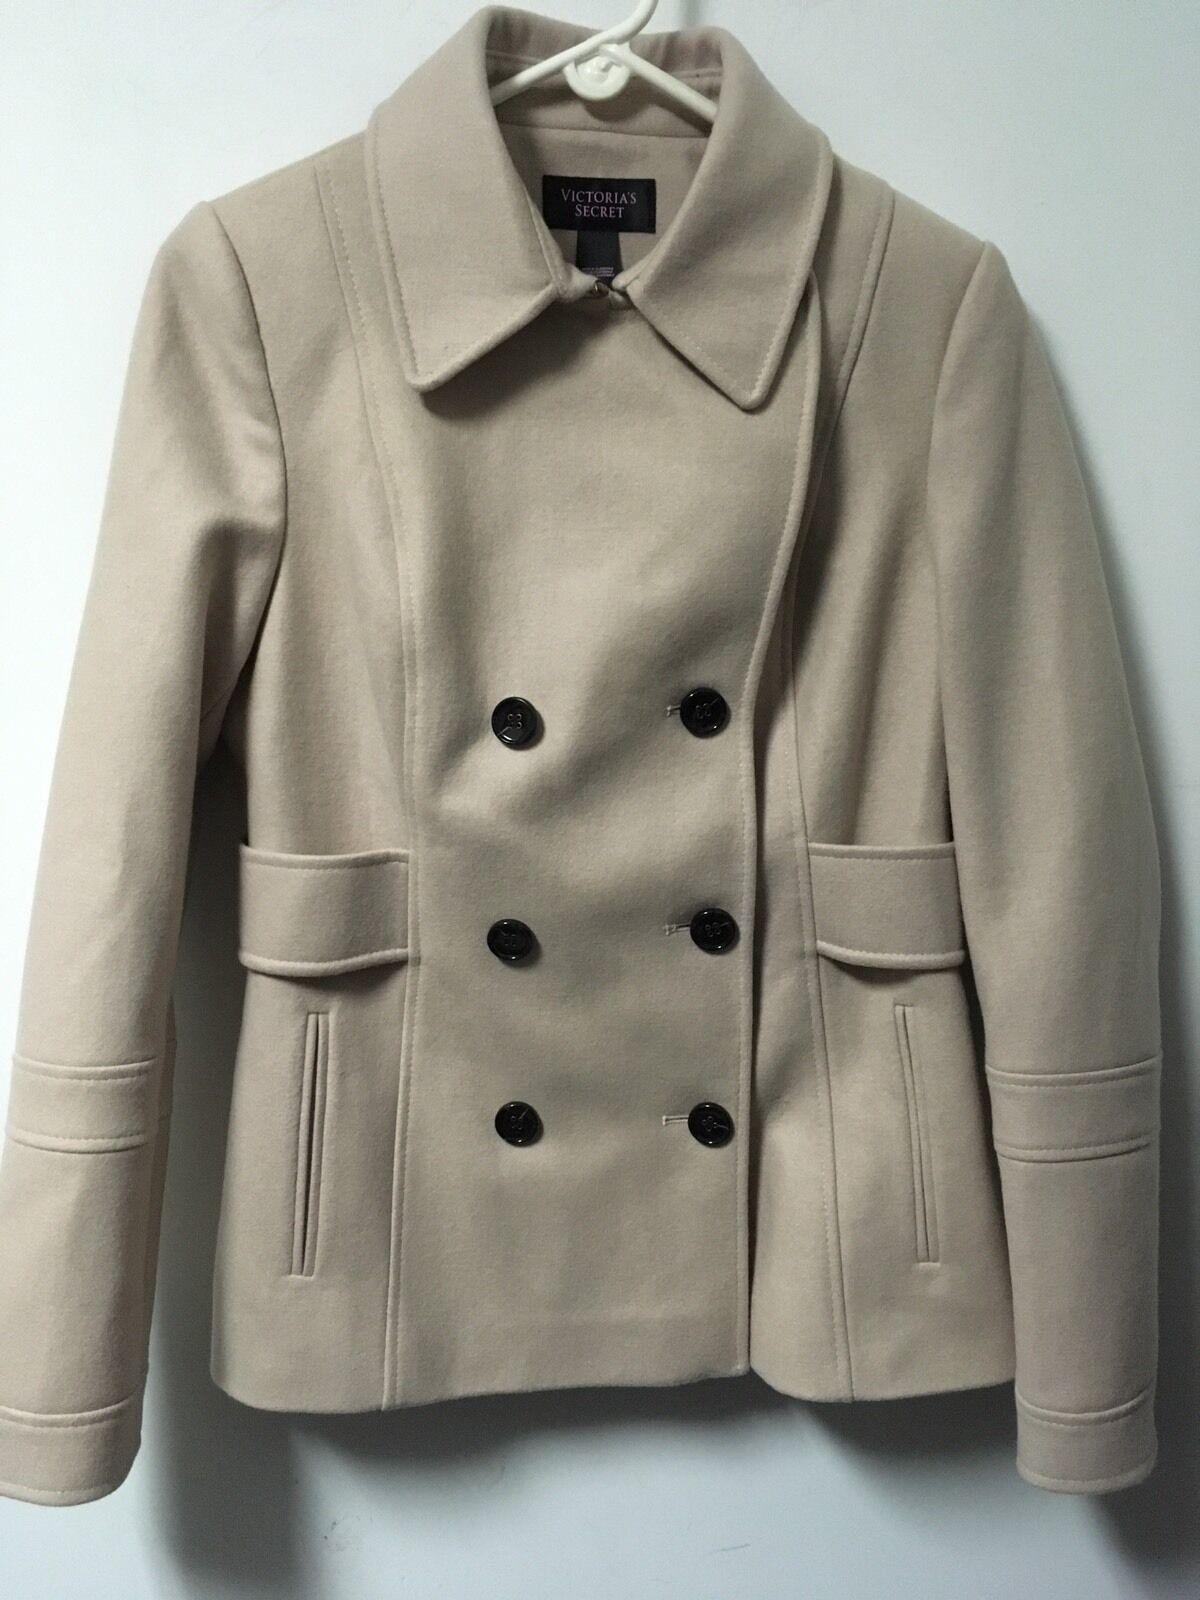 NWOT Victoria's Secret Wool Polyester Viscose Pea Coat Size Size Size 10 Beige d623e8